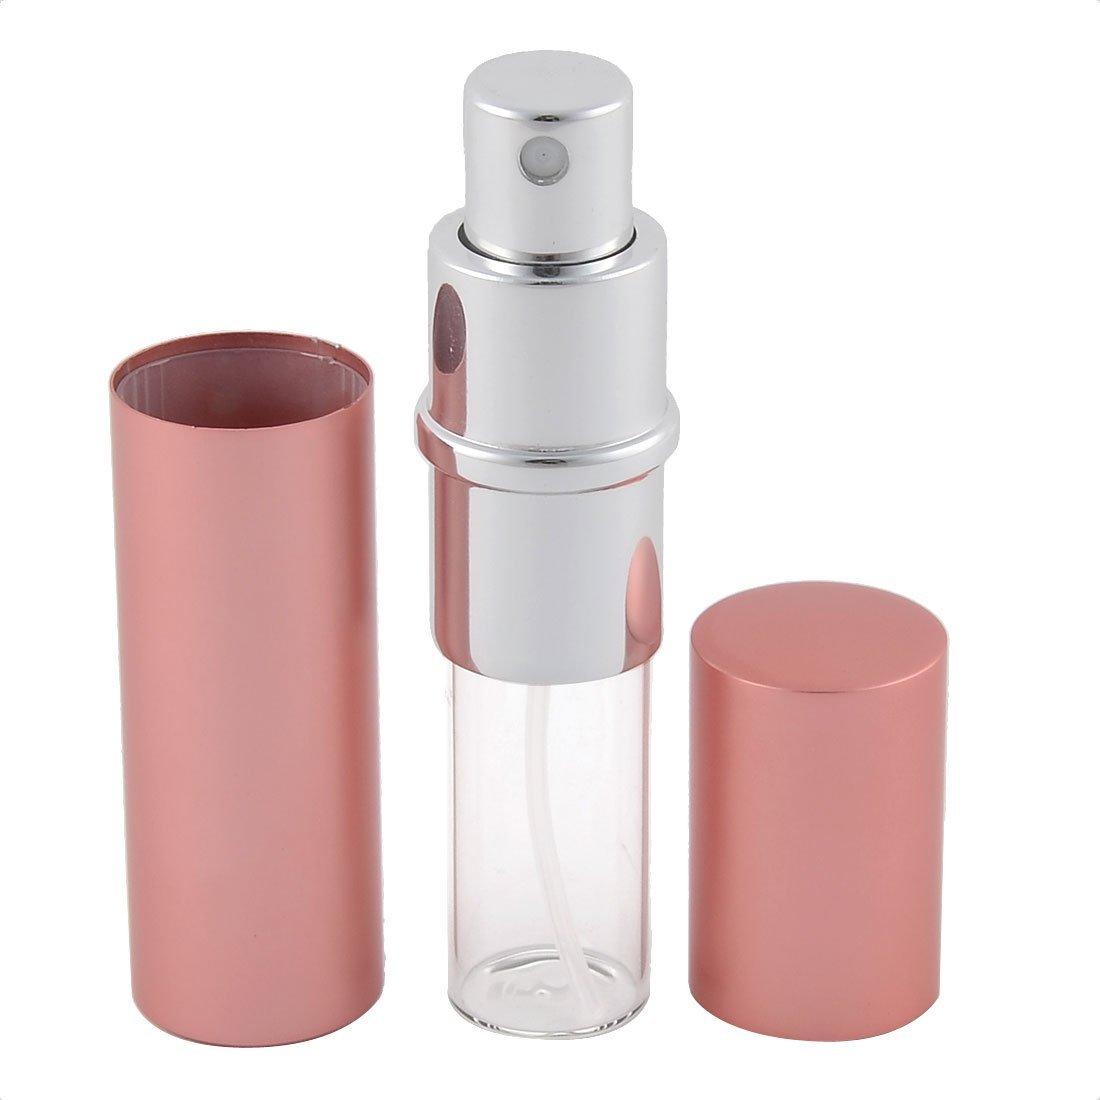 Amazon.com: eDealMax portátil de viaje en Forma de lápiz Labial Botella de Perfume recargable del 10 mL rosa: Home & Kitchen